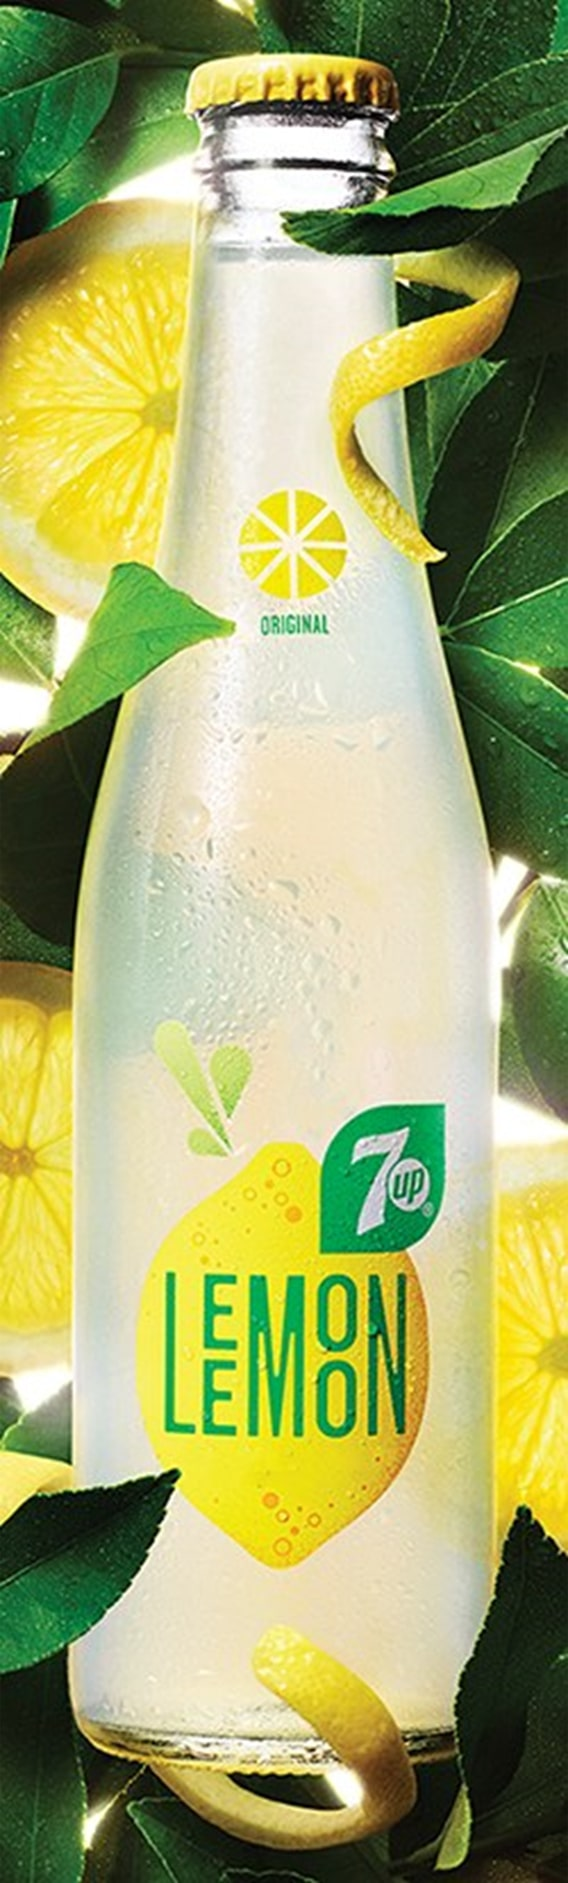 For PepsiCo by PepsiCo Design & Innovation